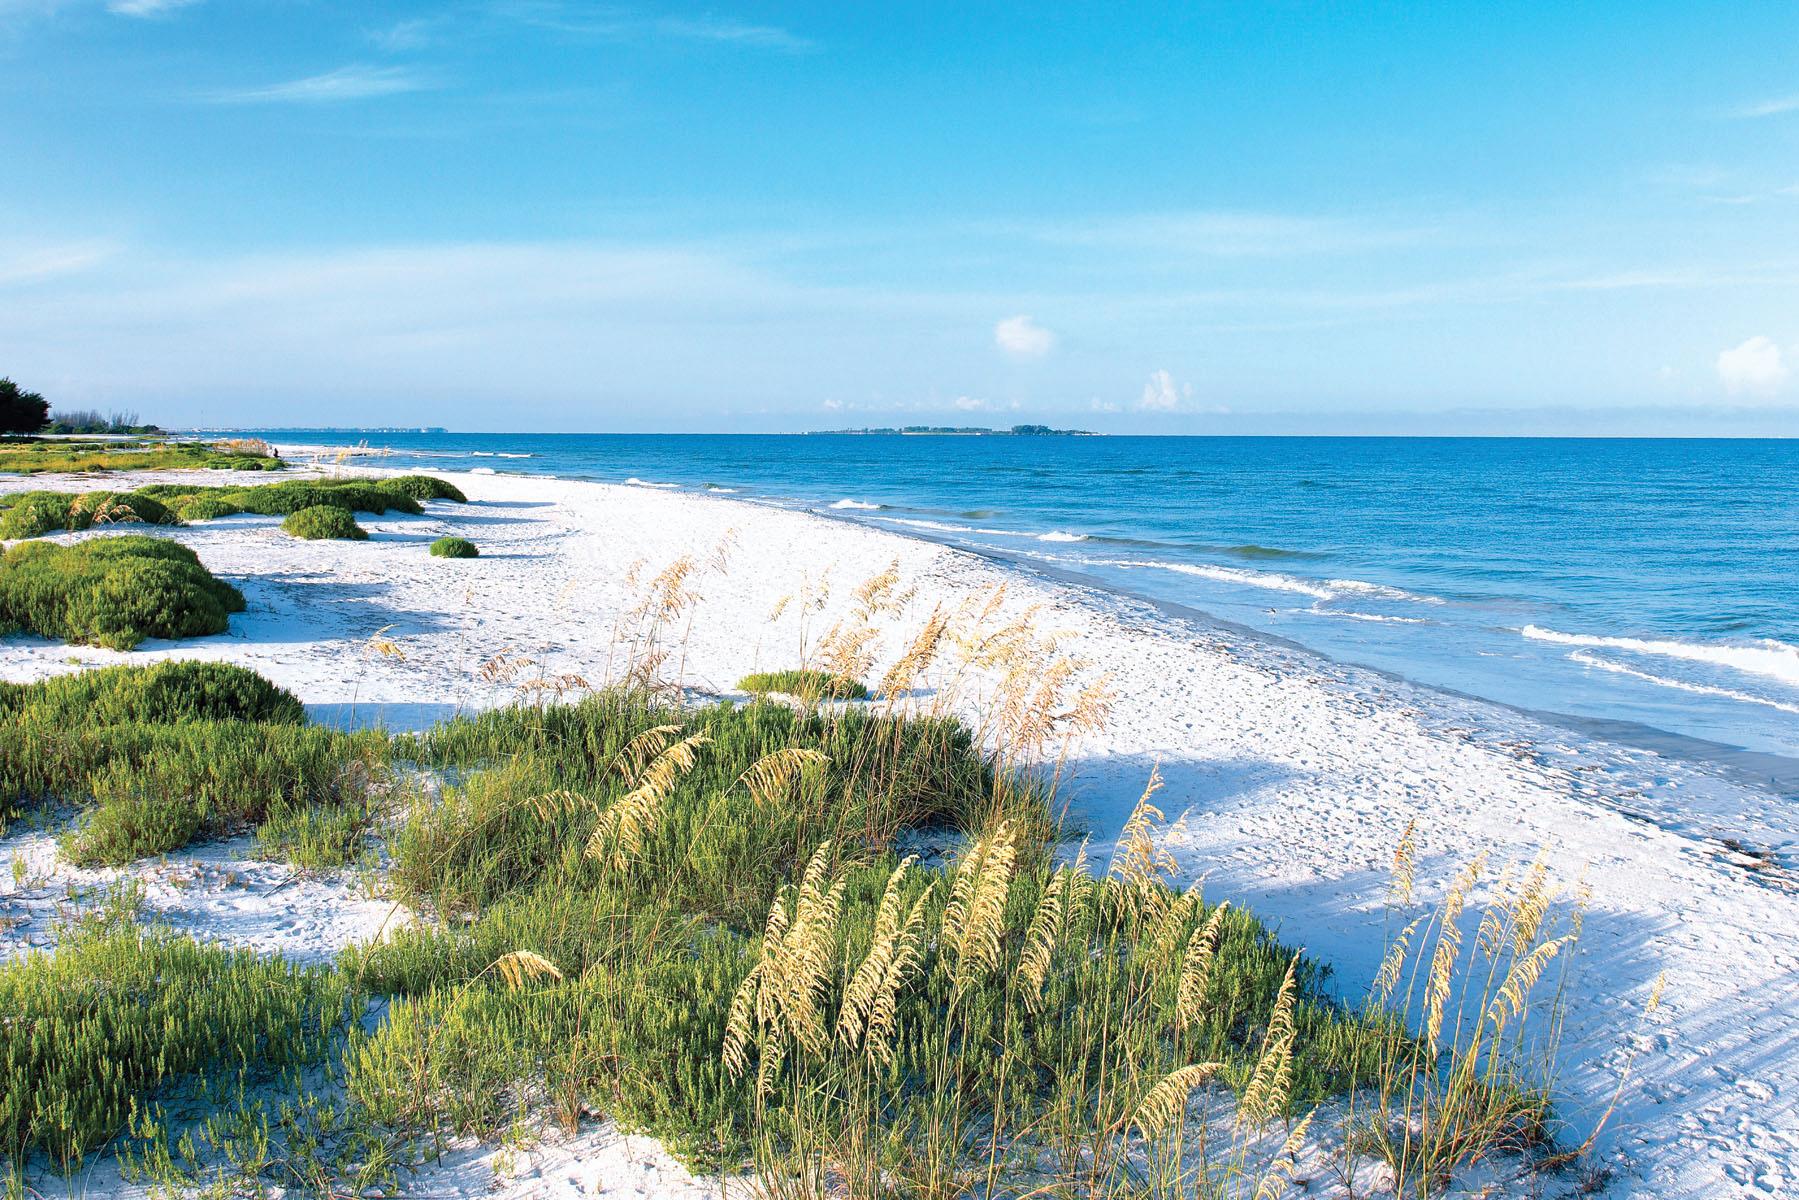 beach_FtDesoto4_SYRpcUp-jk4j0TZcGNDlzKq_rgb_l-2.jpg